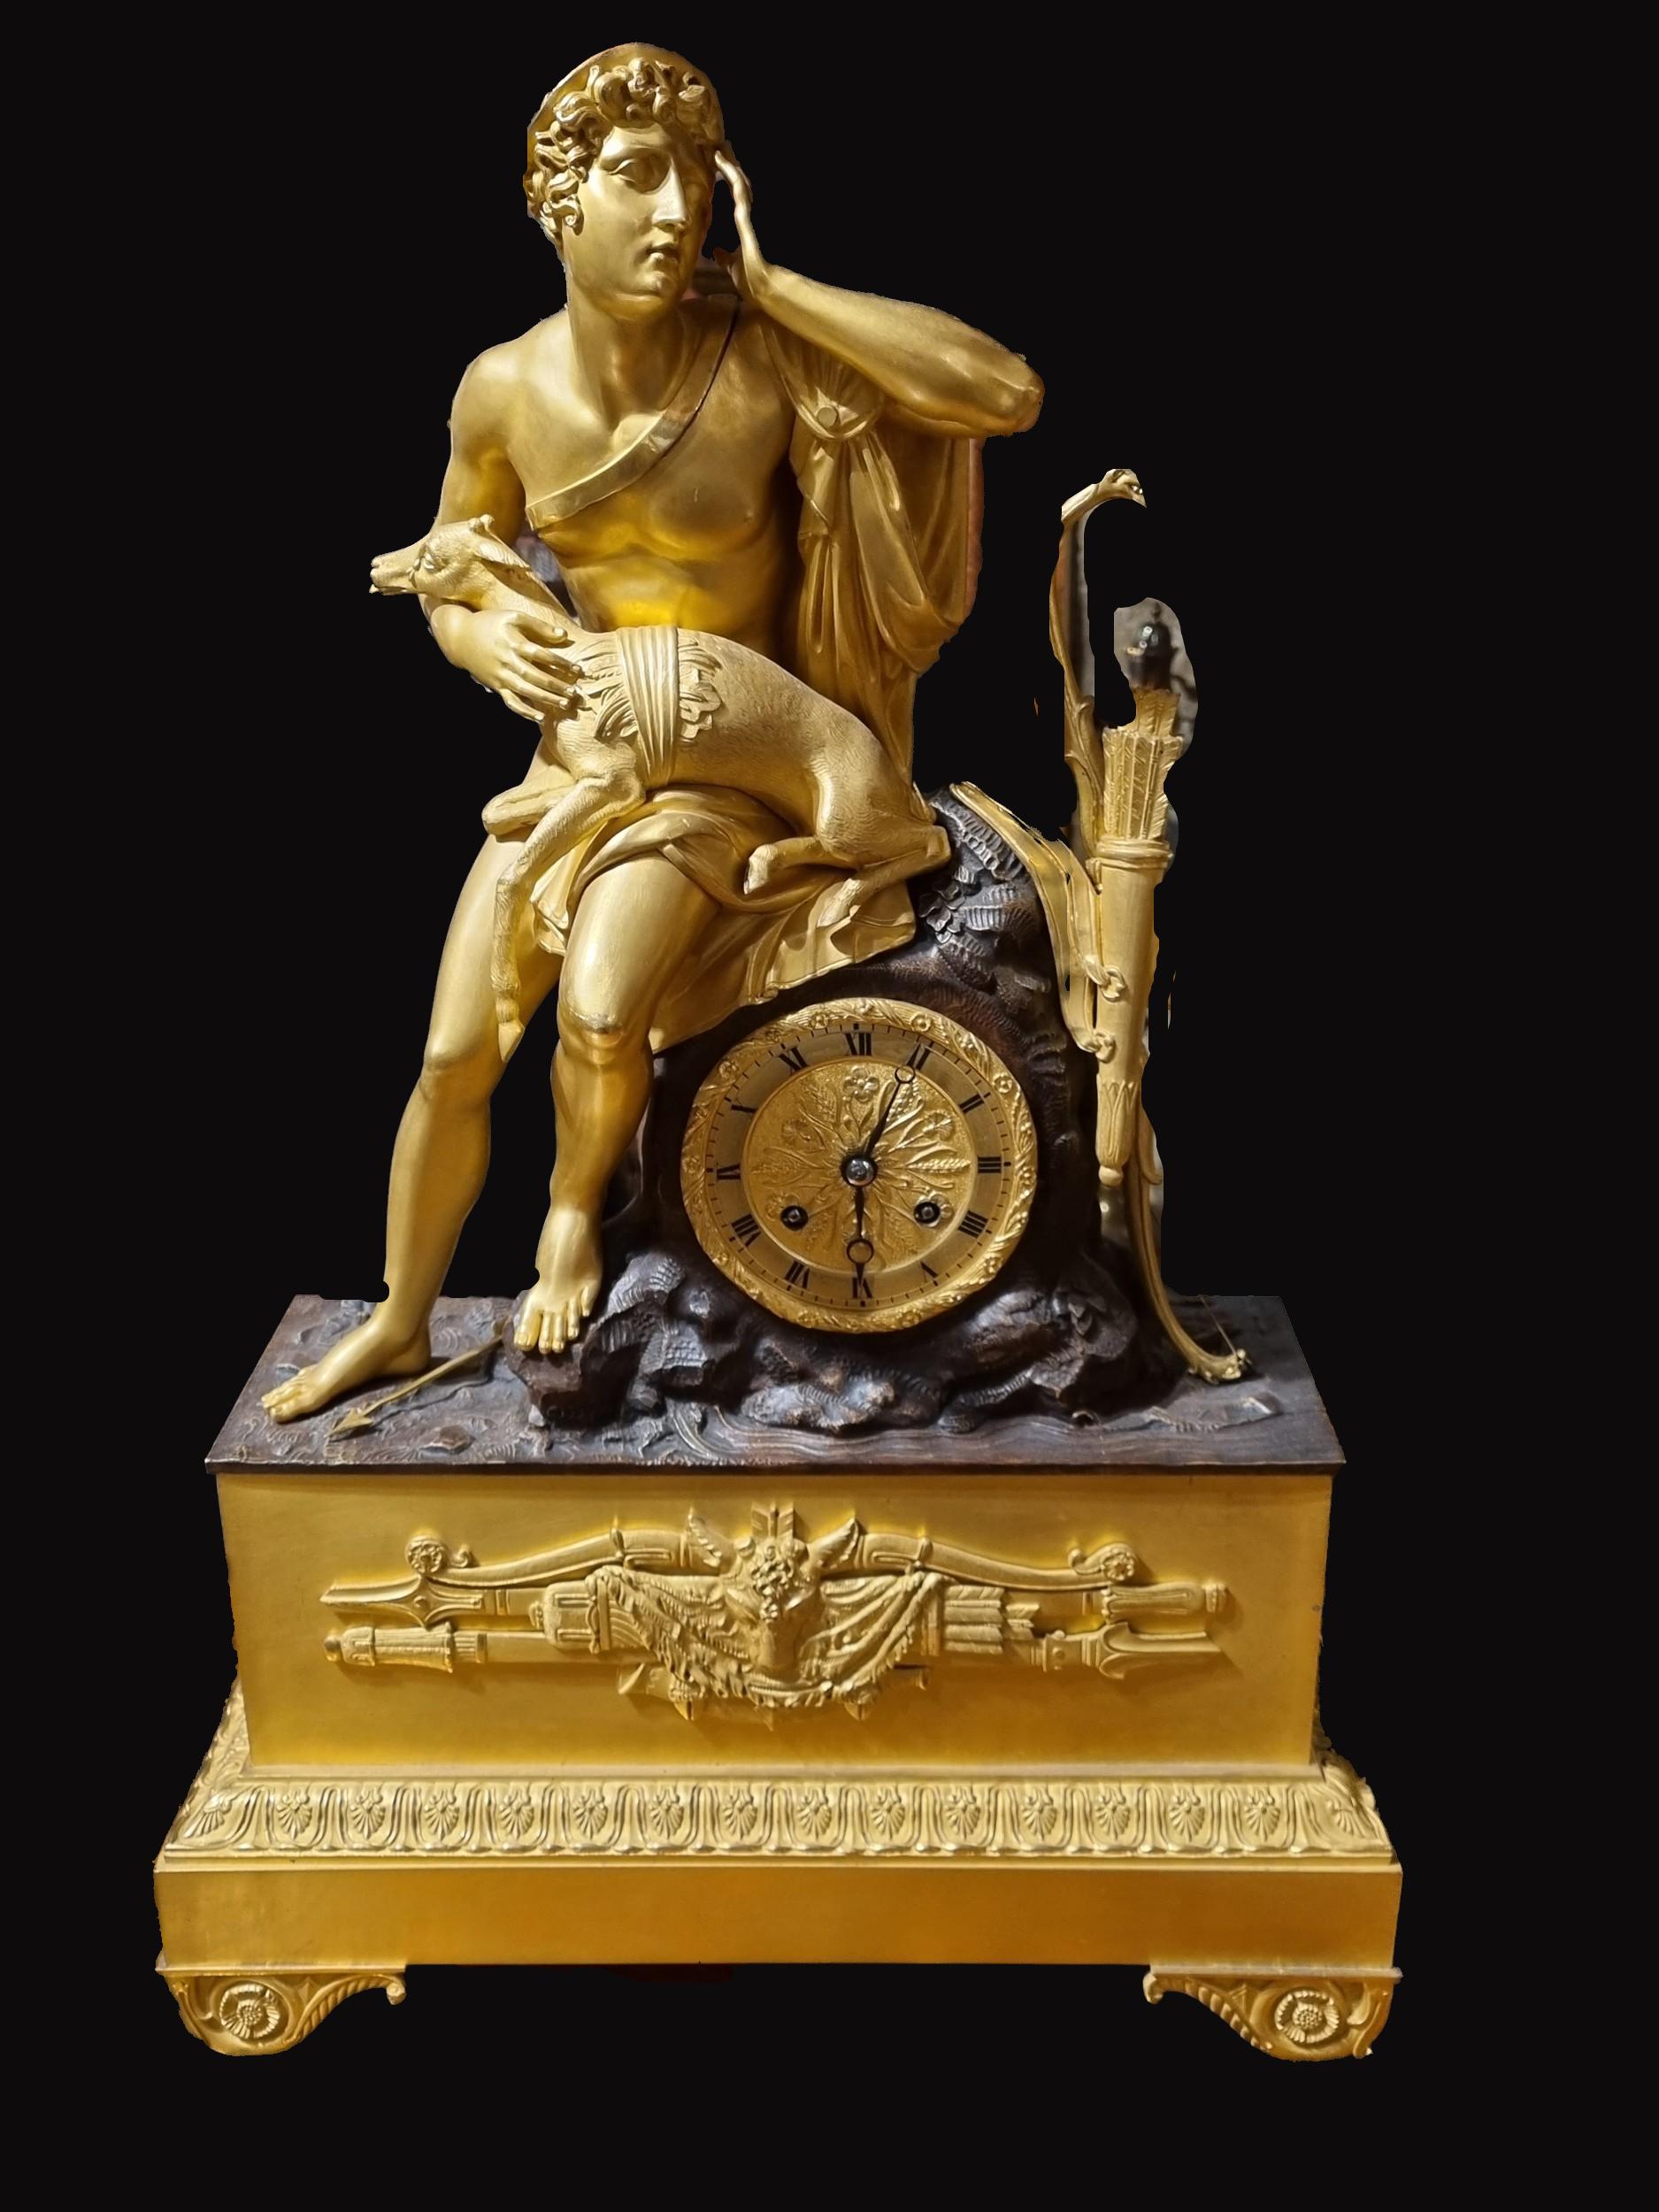 C1830S French Gilt Bronze Mantel Clock